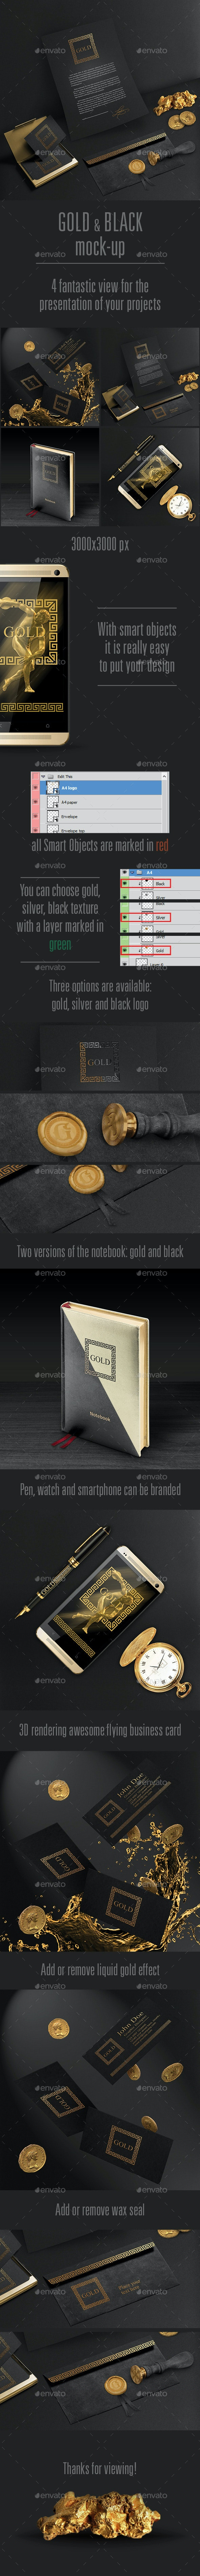 Gold and Black Stationary / Branding Mock-Up - Stationery Print